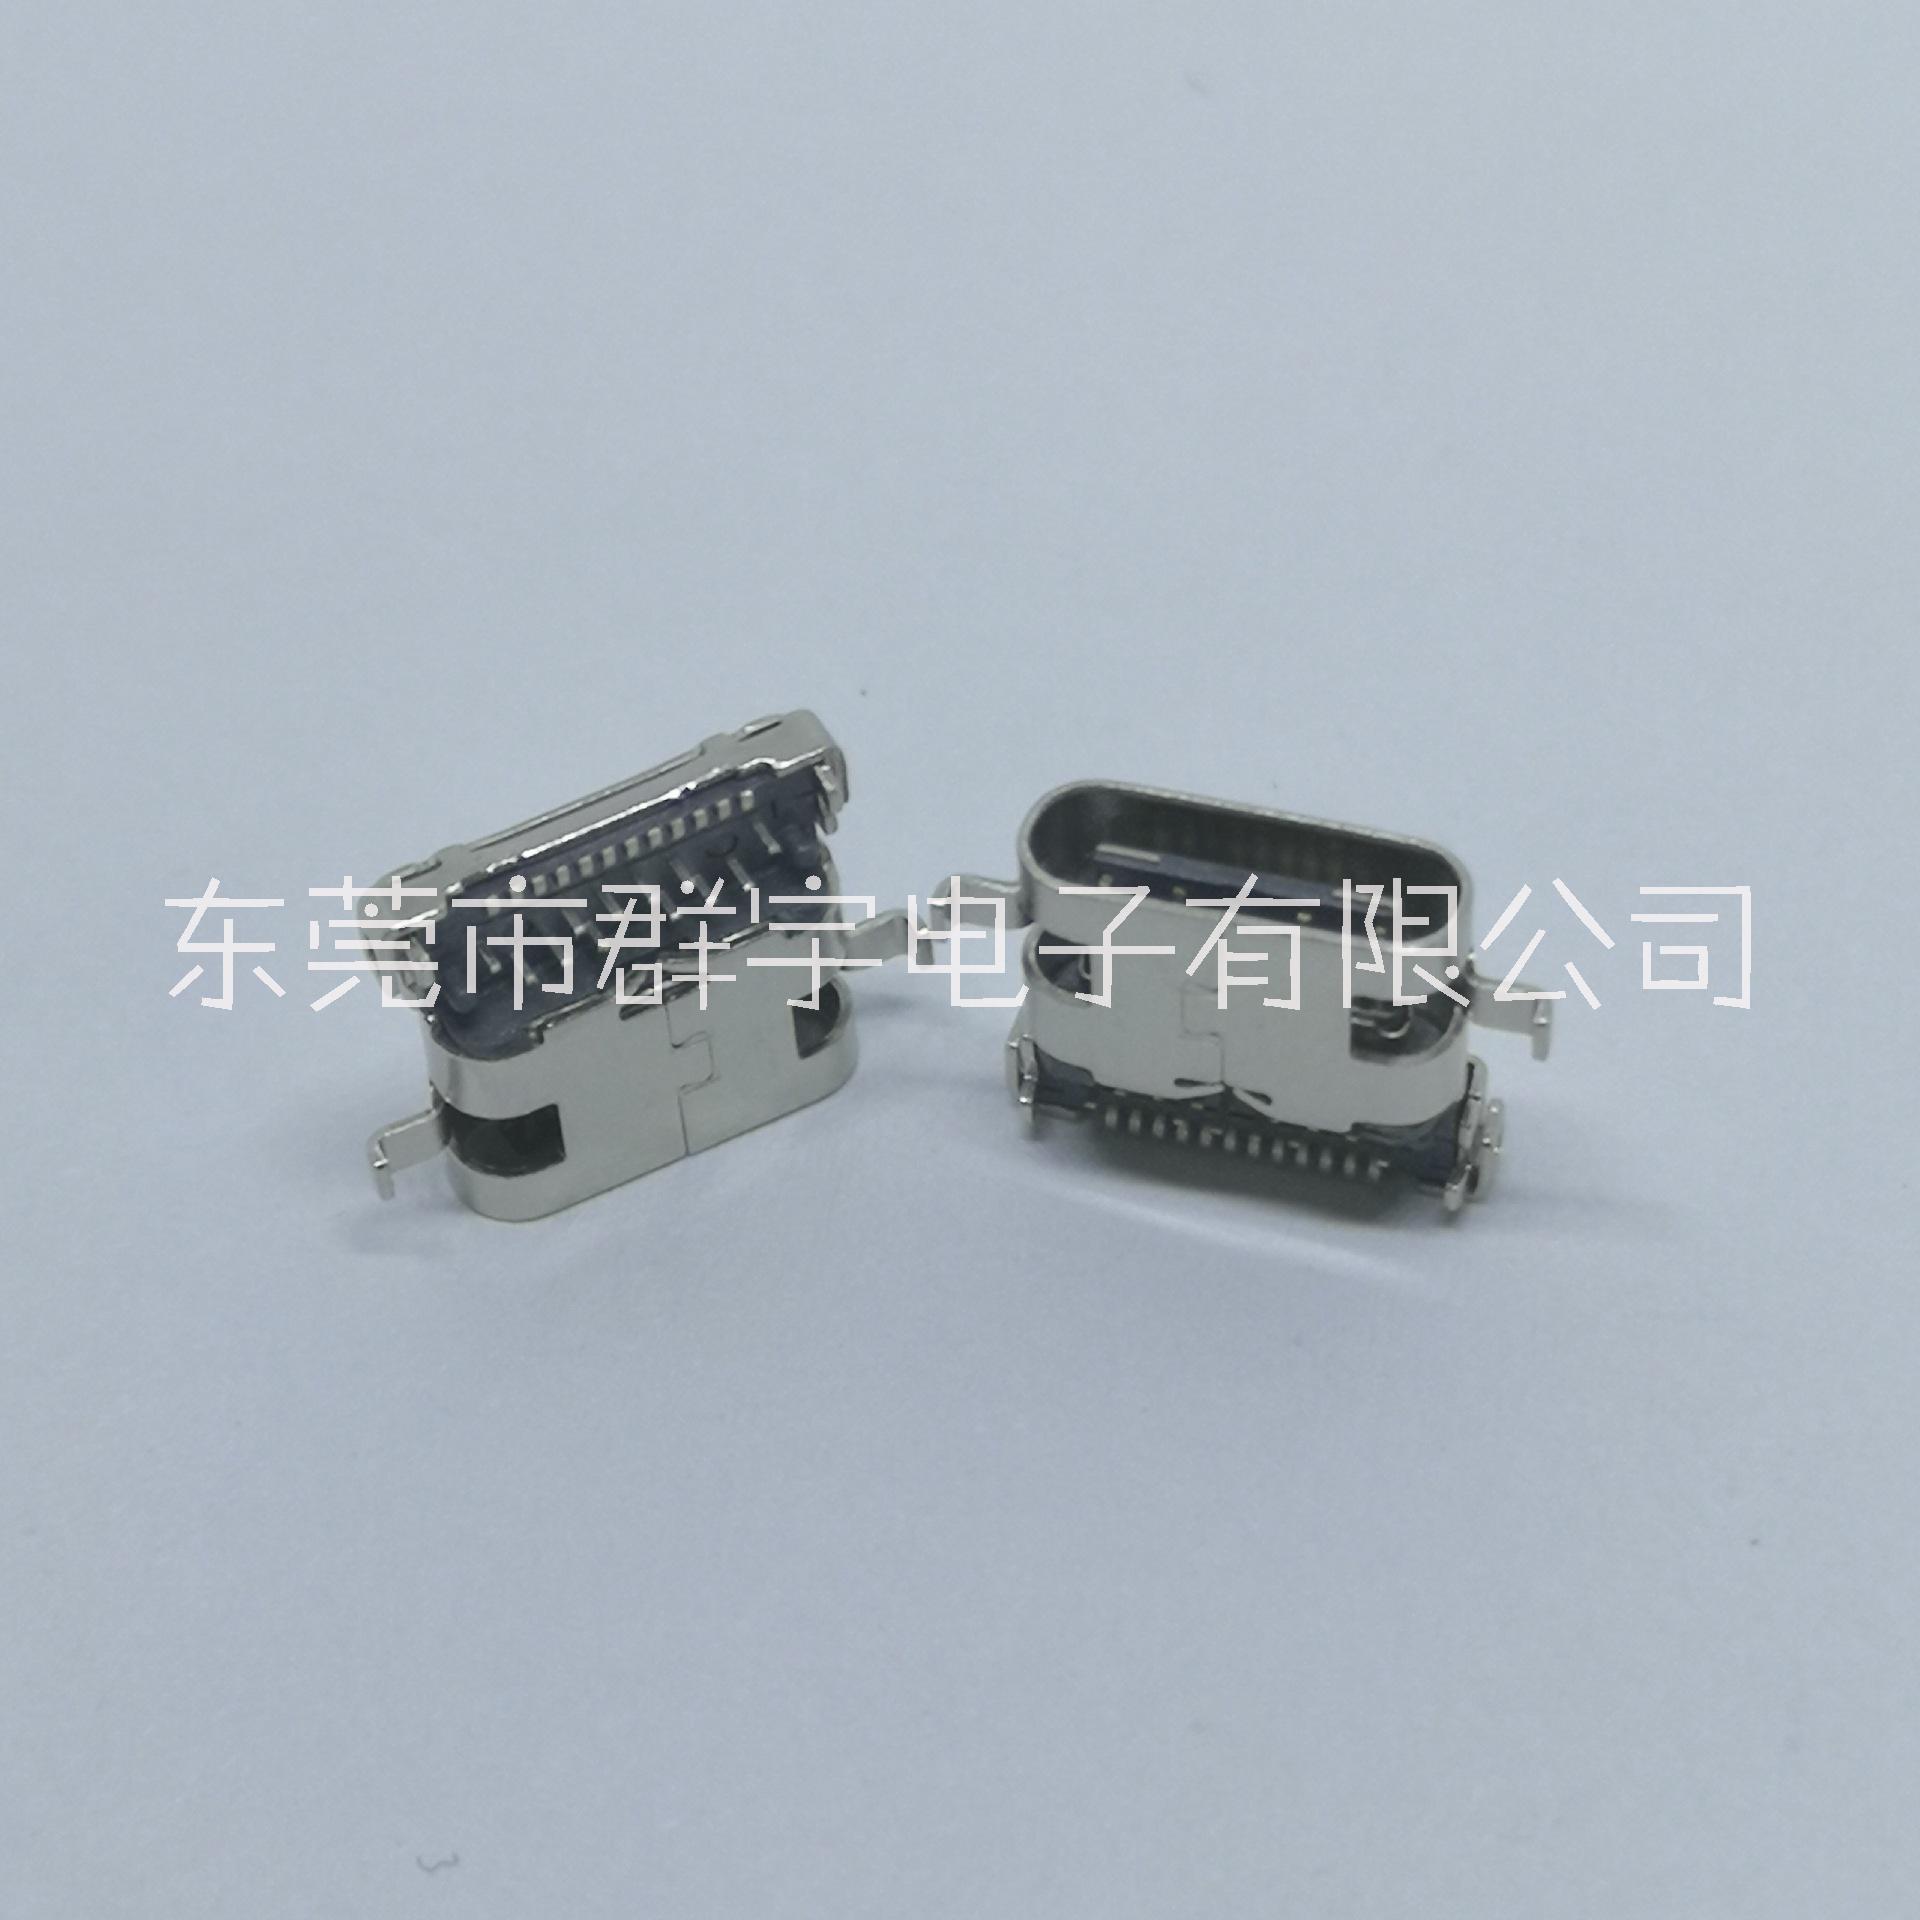 Type-c母座厂家  Type-c母座24P沉板2.0价格  销售 定制 【东莞市群宇电子有限公司】